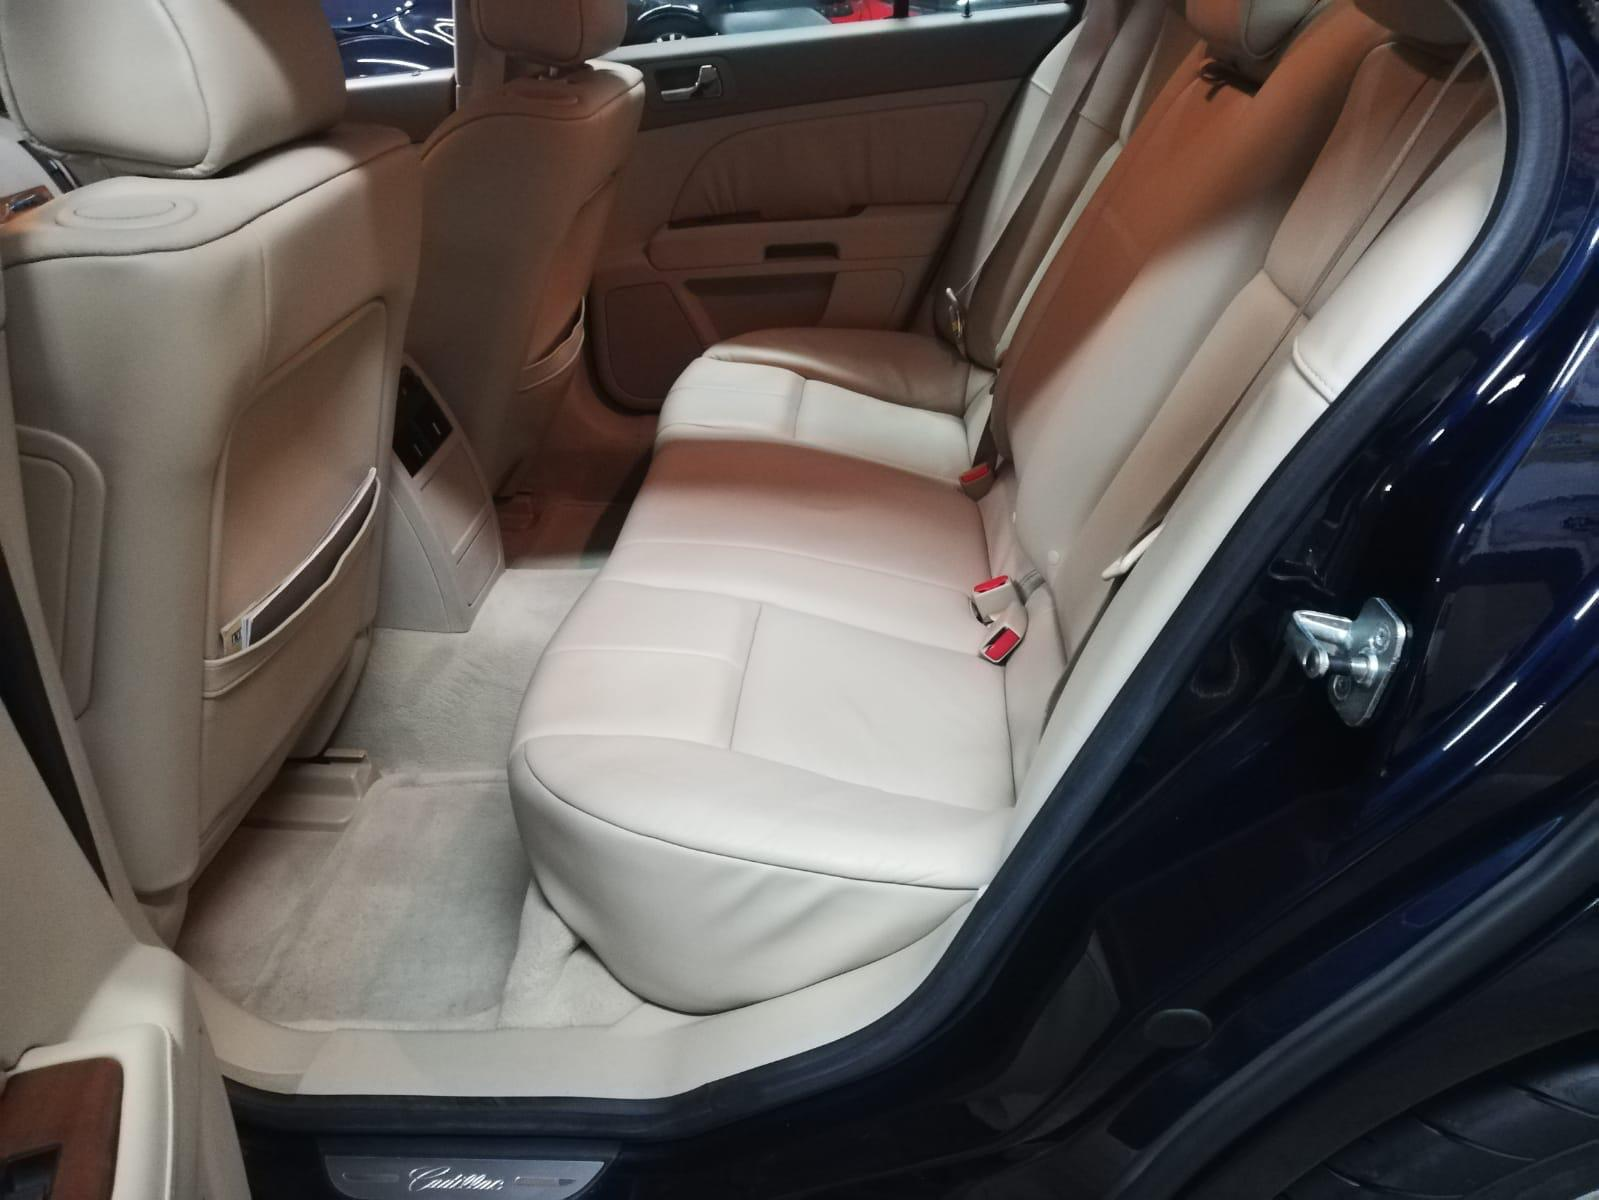 10777 Alquiler Cadillac CTS azul interior 2